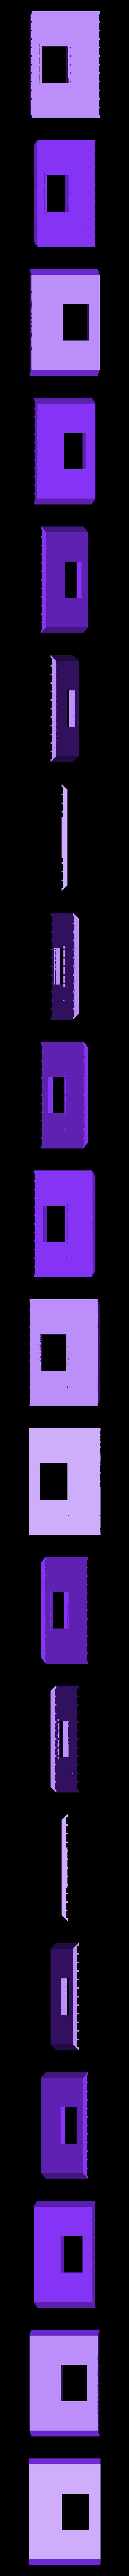 Forward_End_Wall.stl Download free STL file HO Scale Office Trailer • 3D printer design, kabrumble